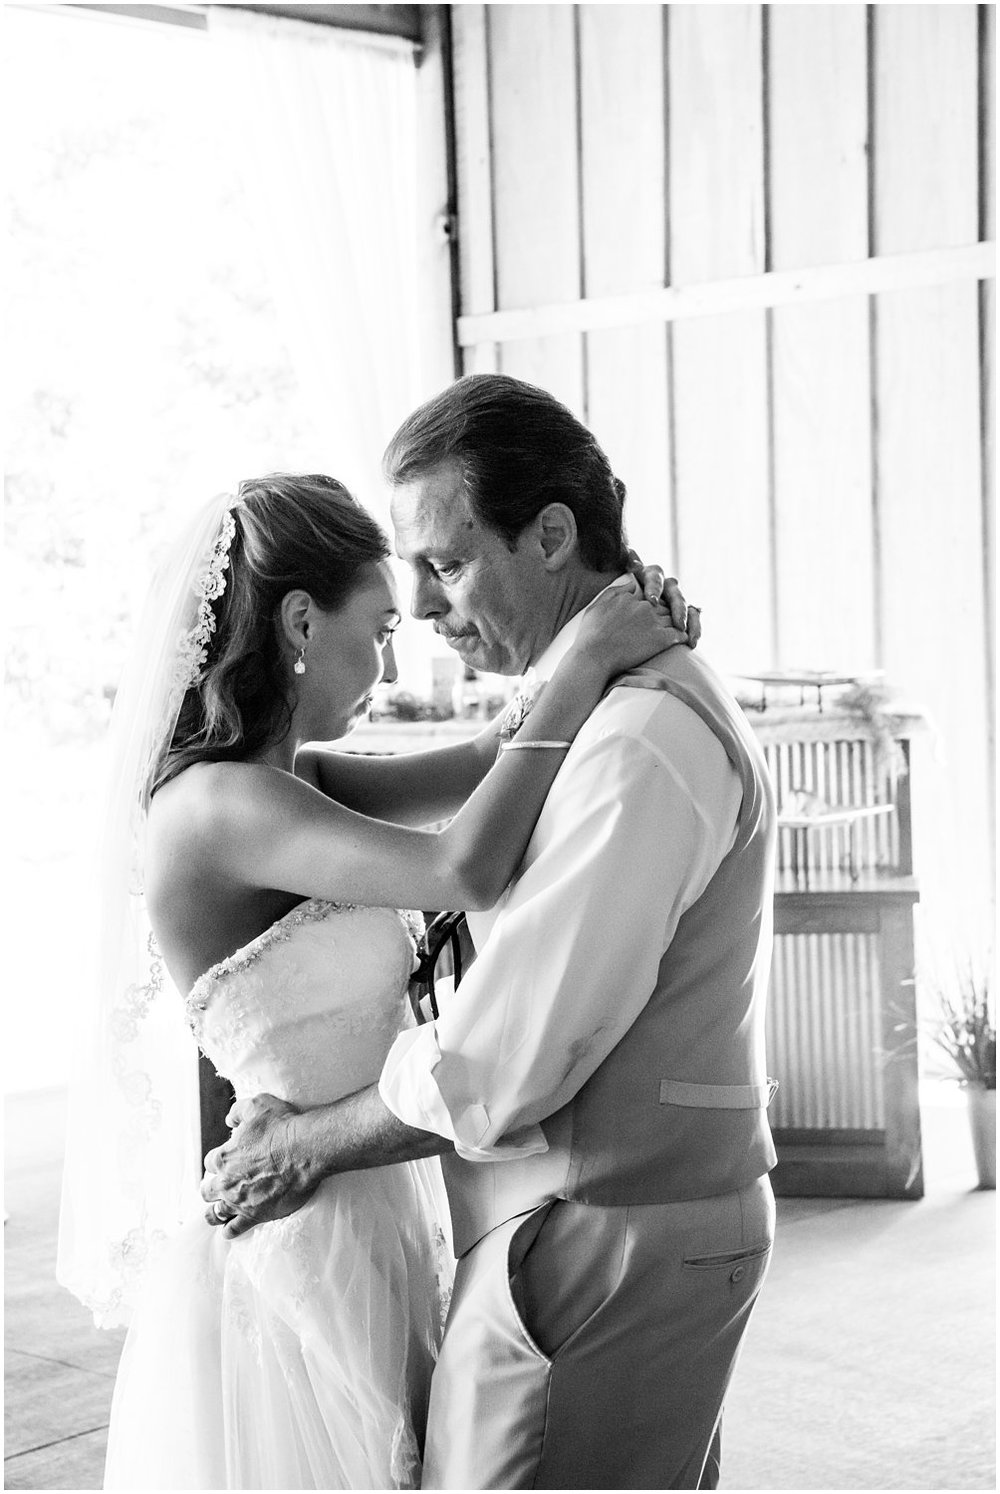 Kyle and Haley Wedding day at Loblolly Rise Plantation, Thomasville Georgia_0049.jpg